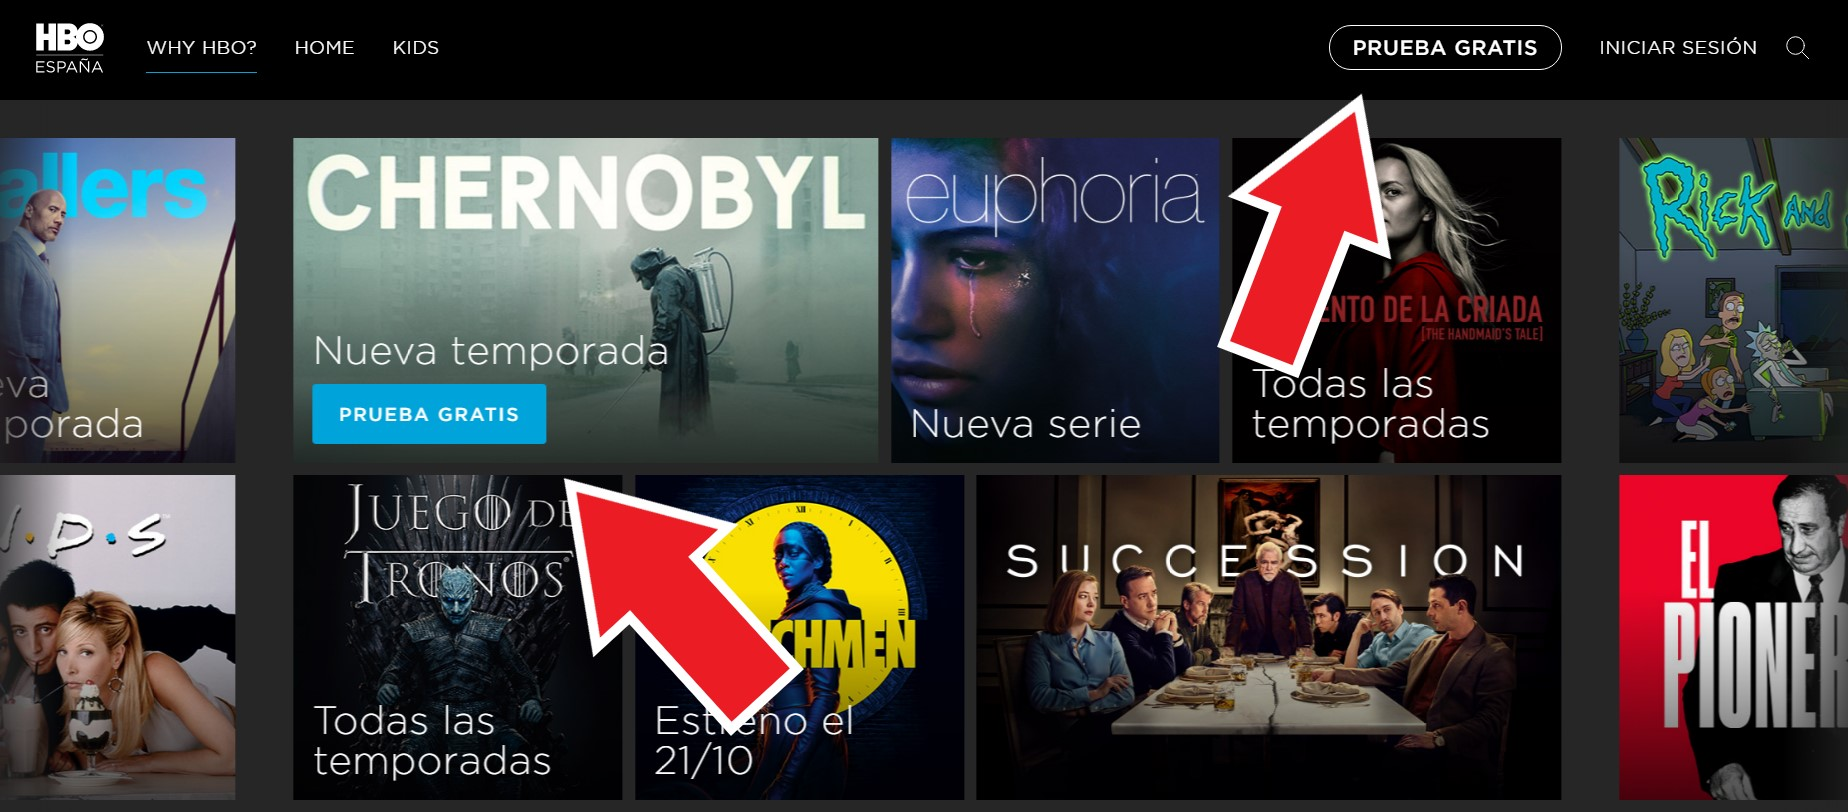 HBO Prueba Gratis